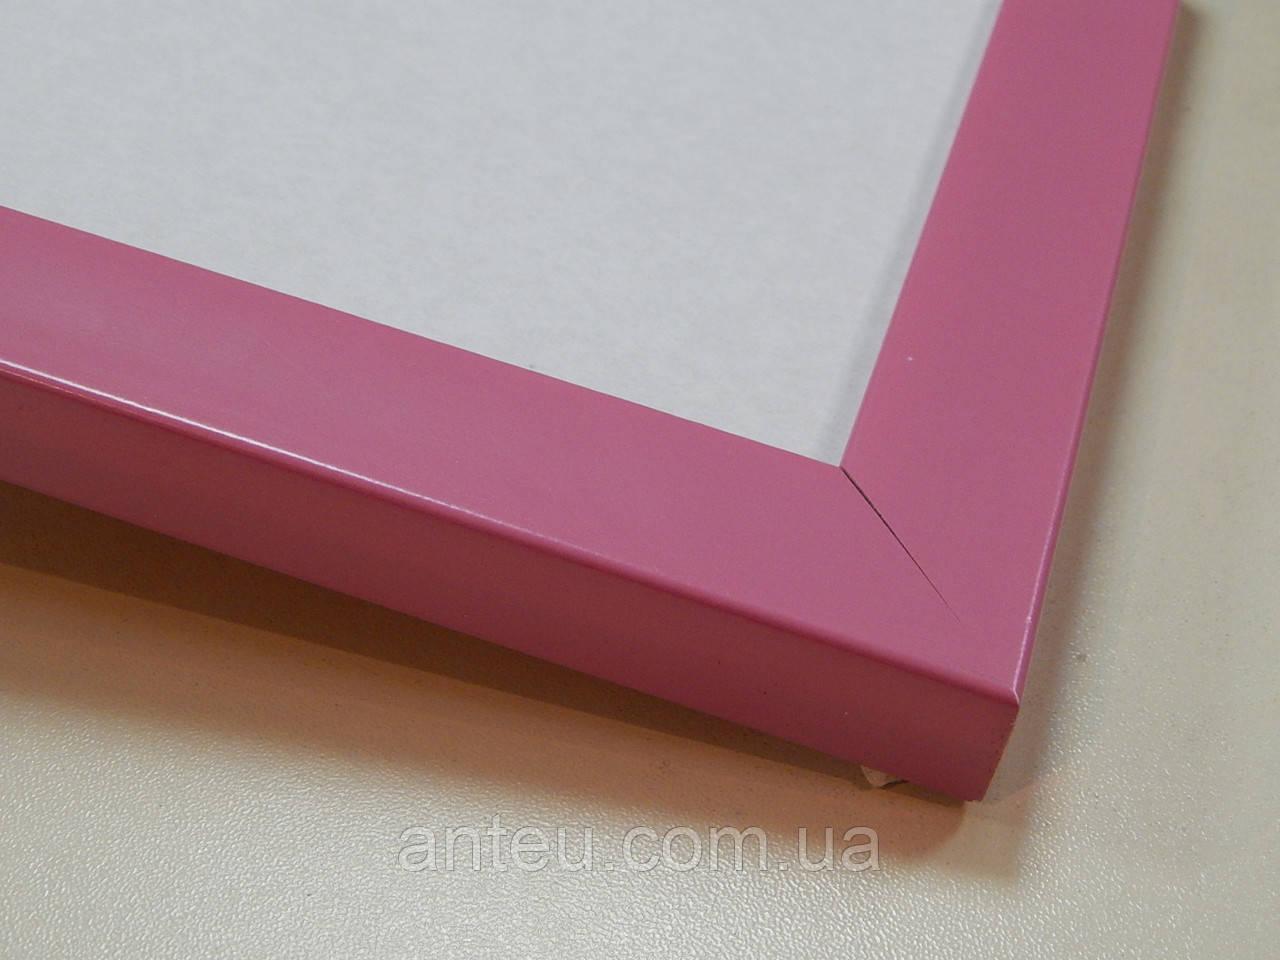 Рамка А4 (210х297).Профиль 22 мм.Розовый.Для фото.